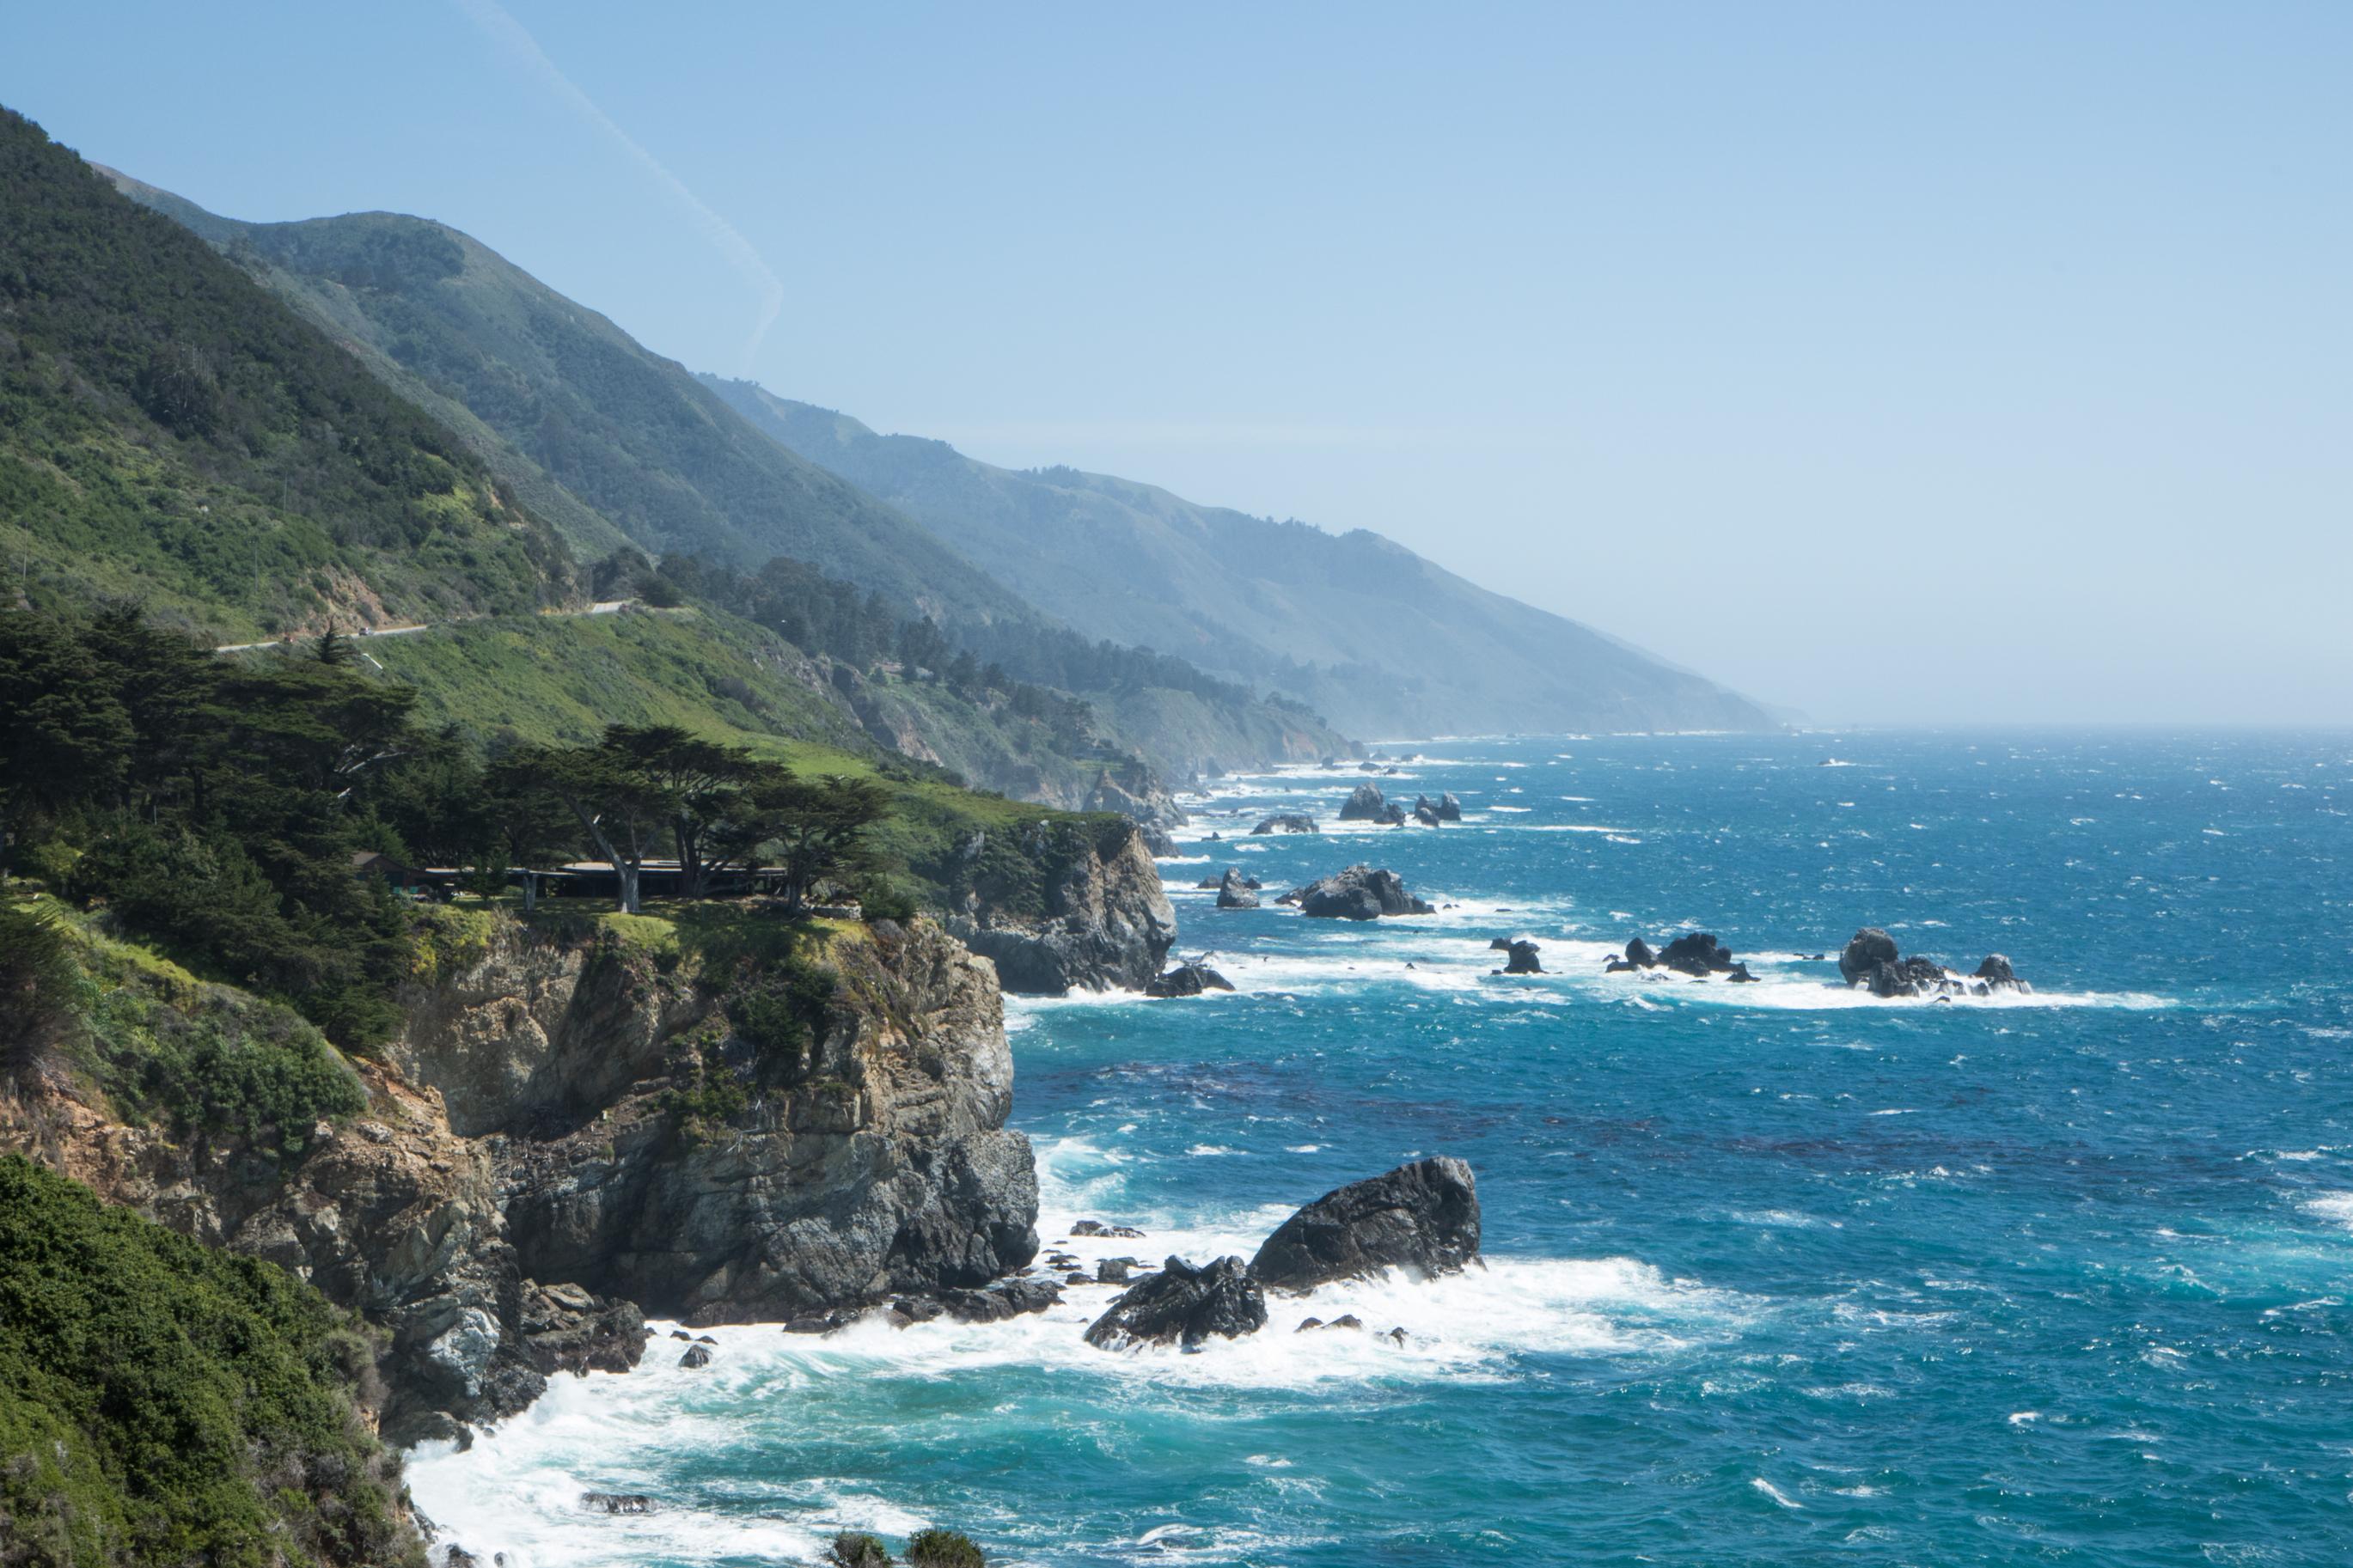 Pacific Coast Highway view Big Sur California Not So SAHM